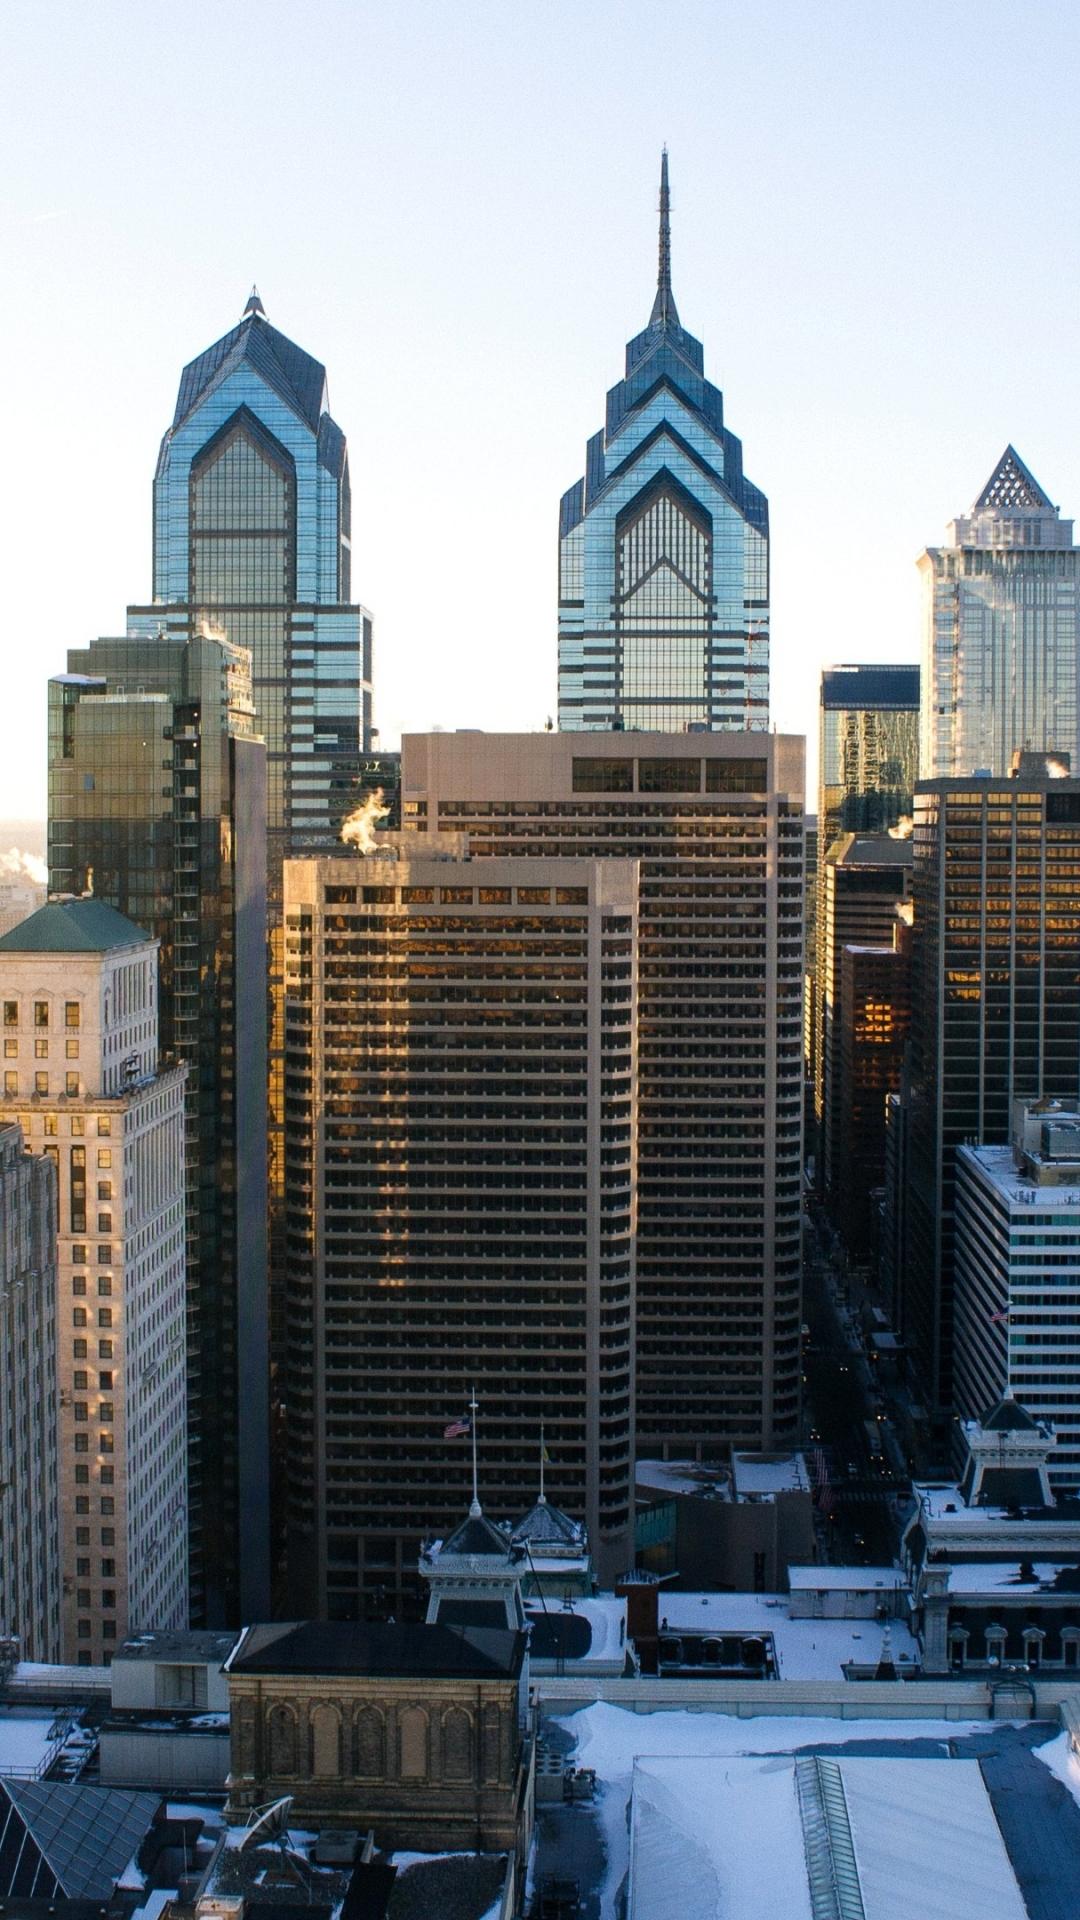 Man Made Philadelphia 1080x1920 Wallpaper Id 586395